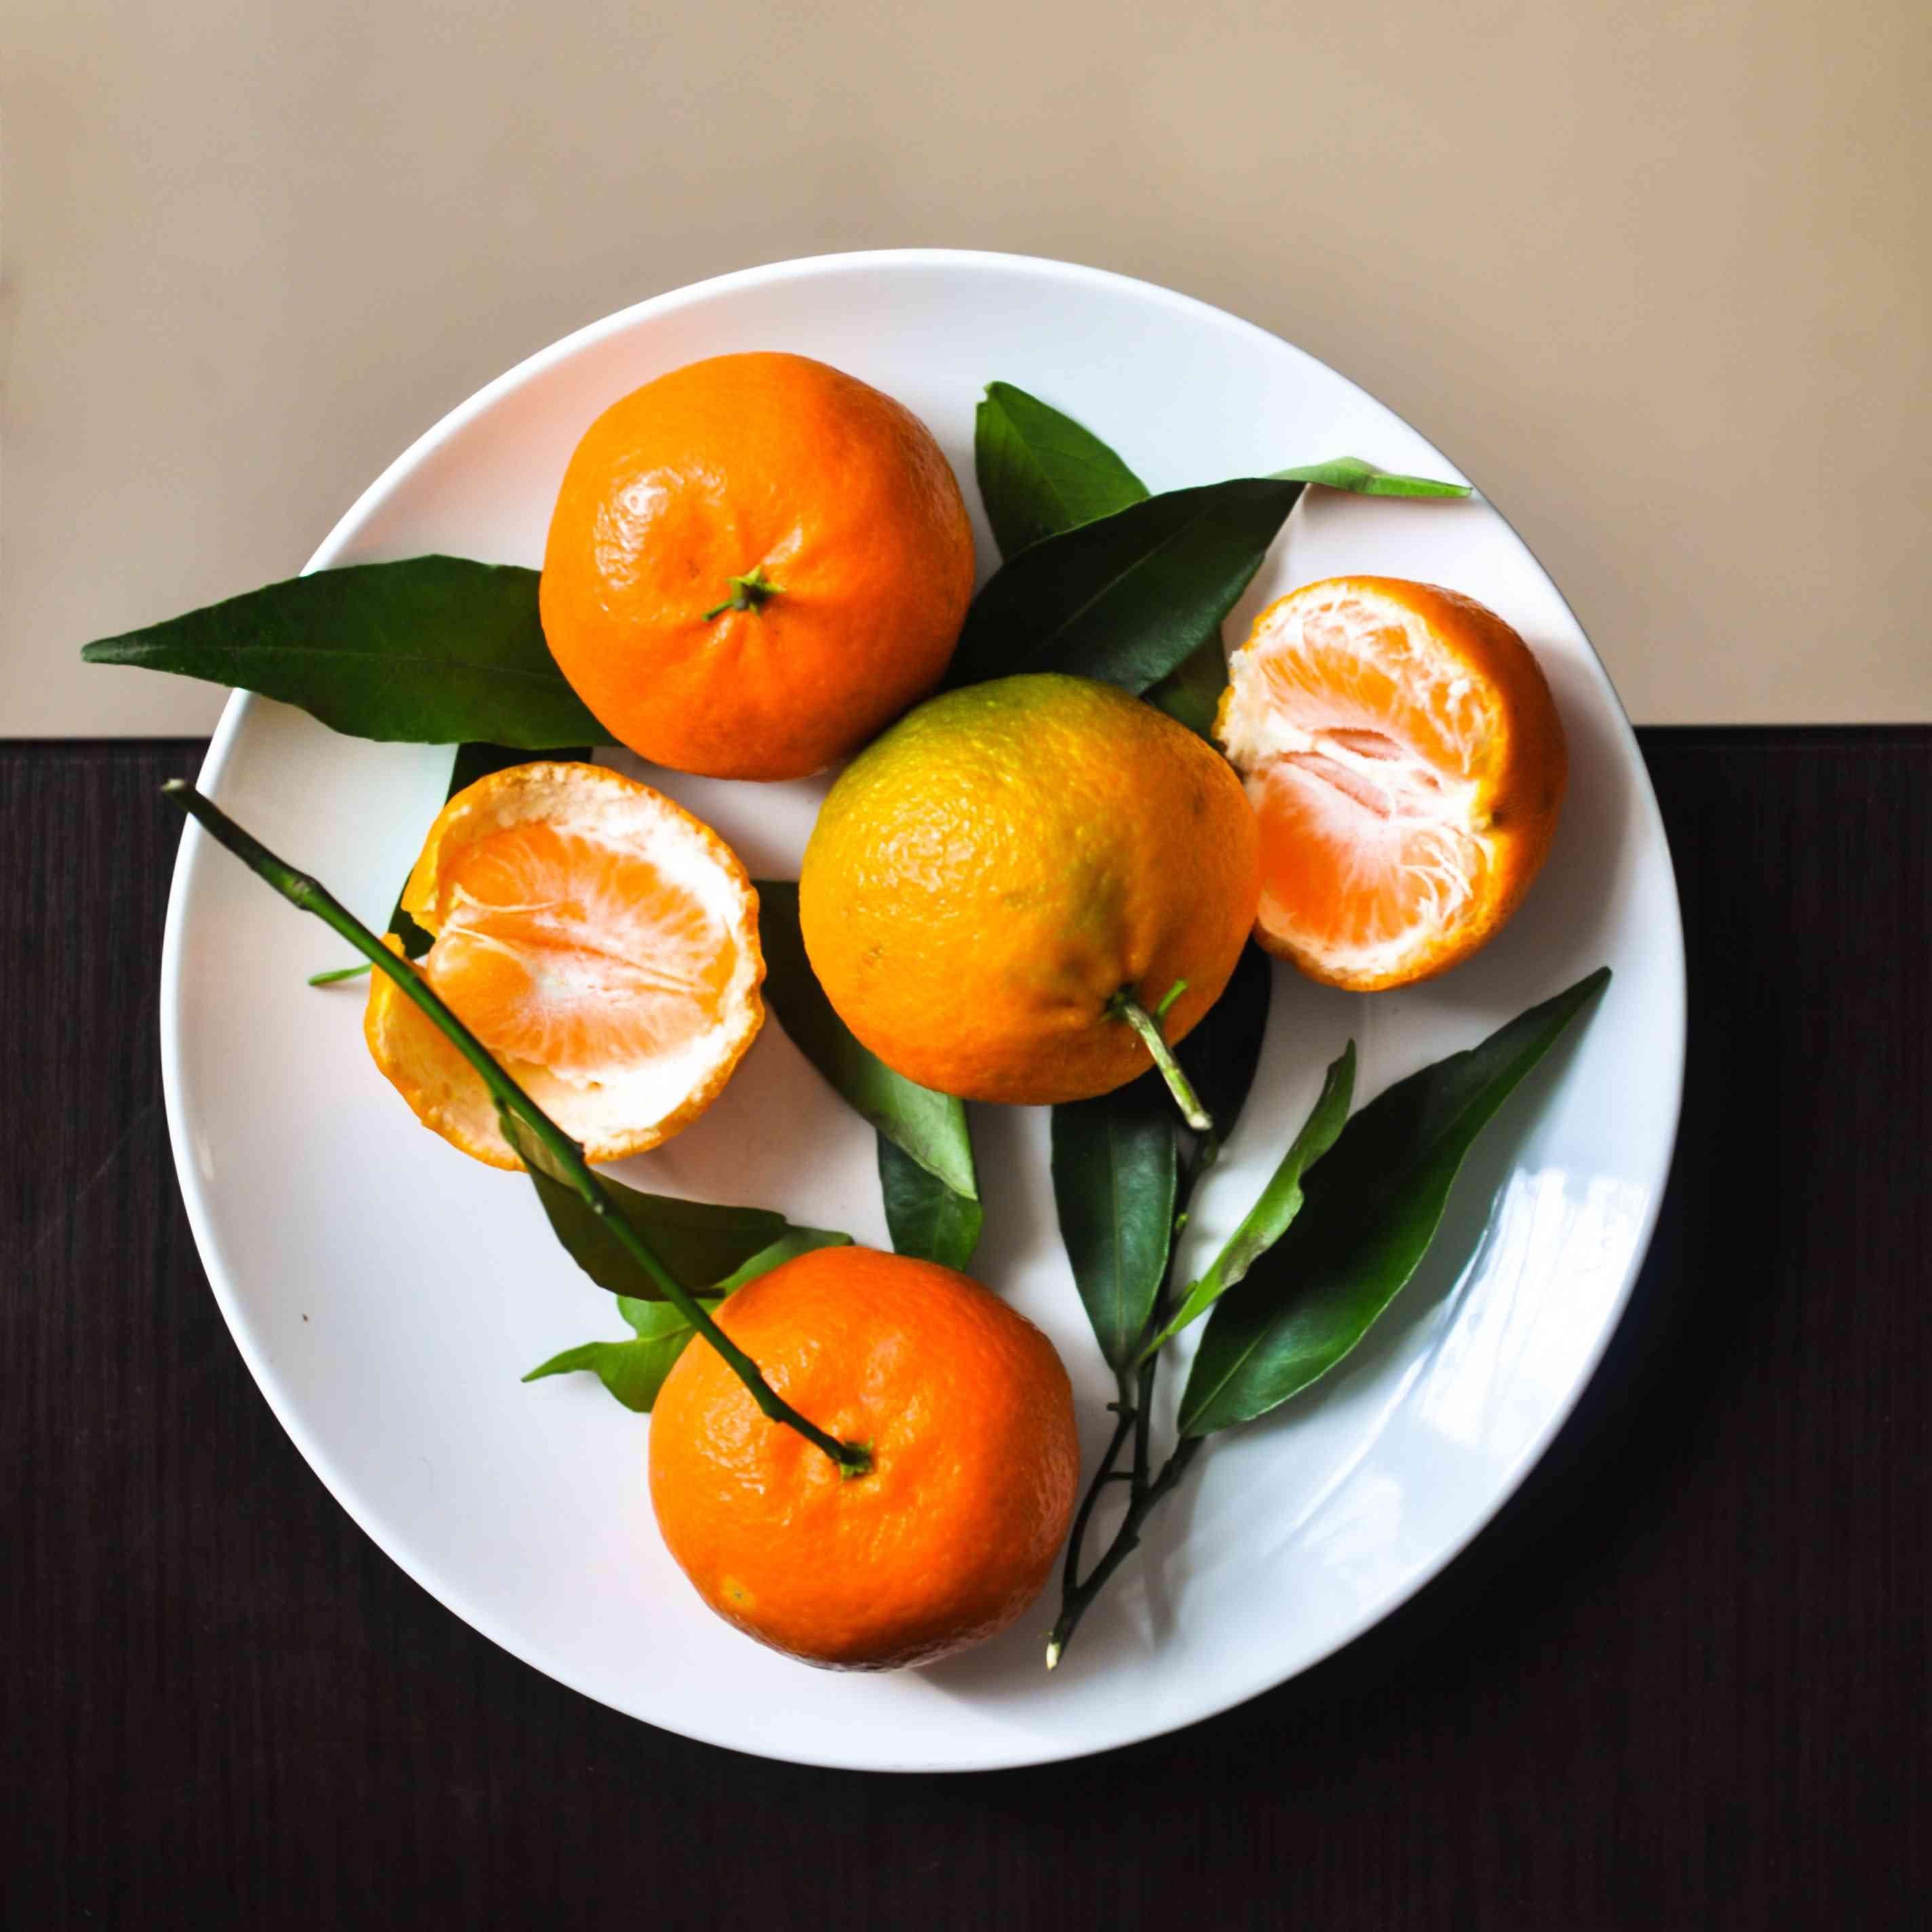 mandarinas en un plato blanco